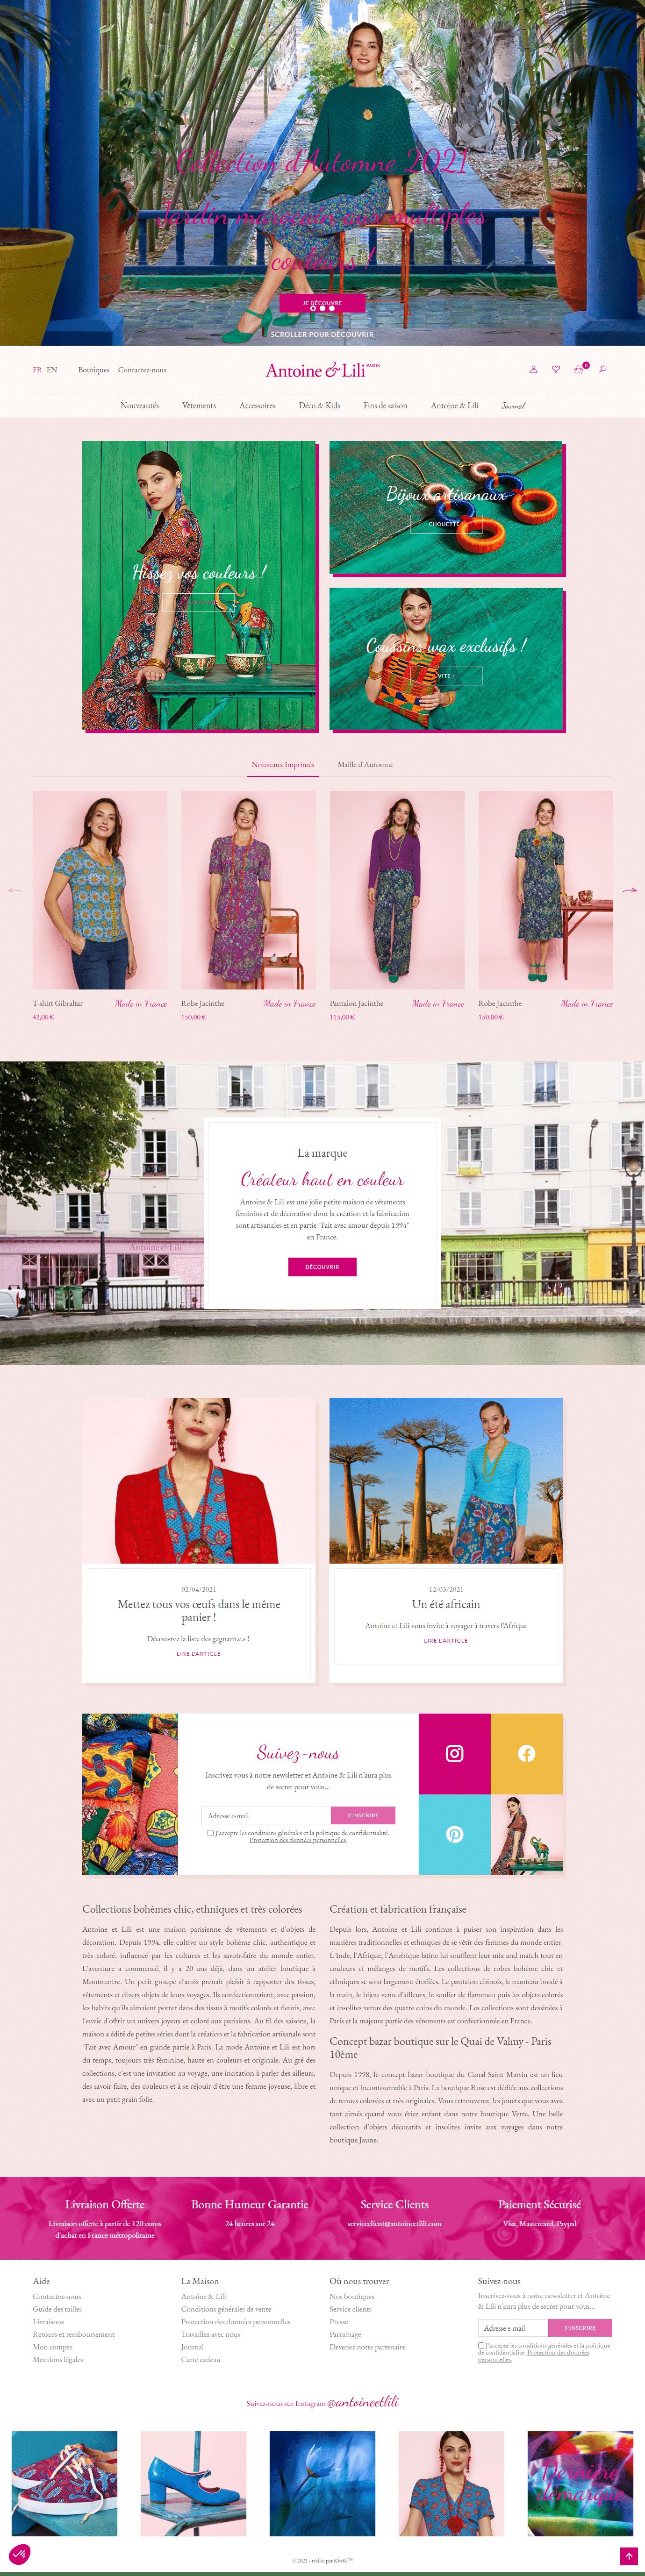 site e-commerce prestashop antoine et lili